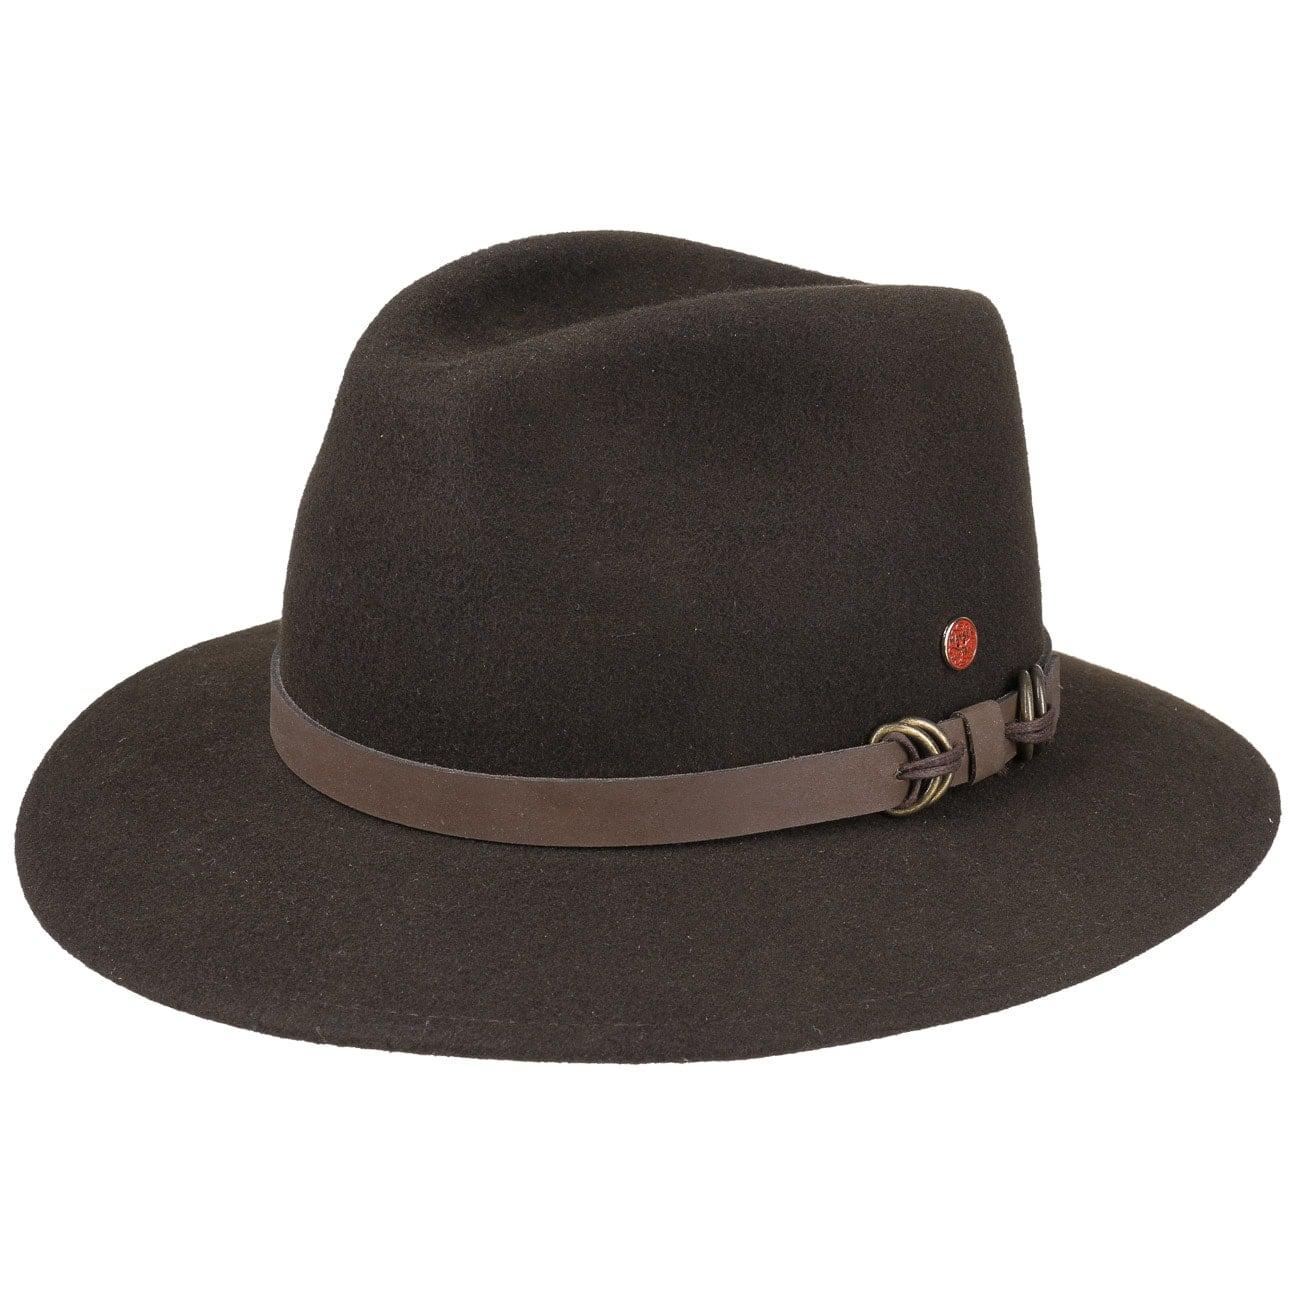 Sombrero Baron Georgia by Mayser